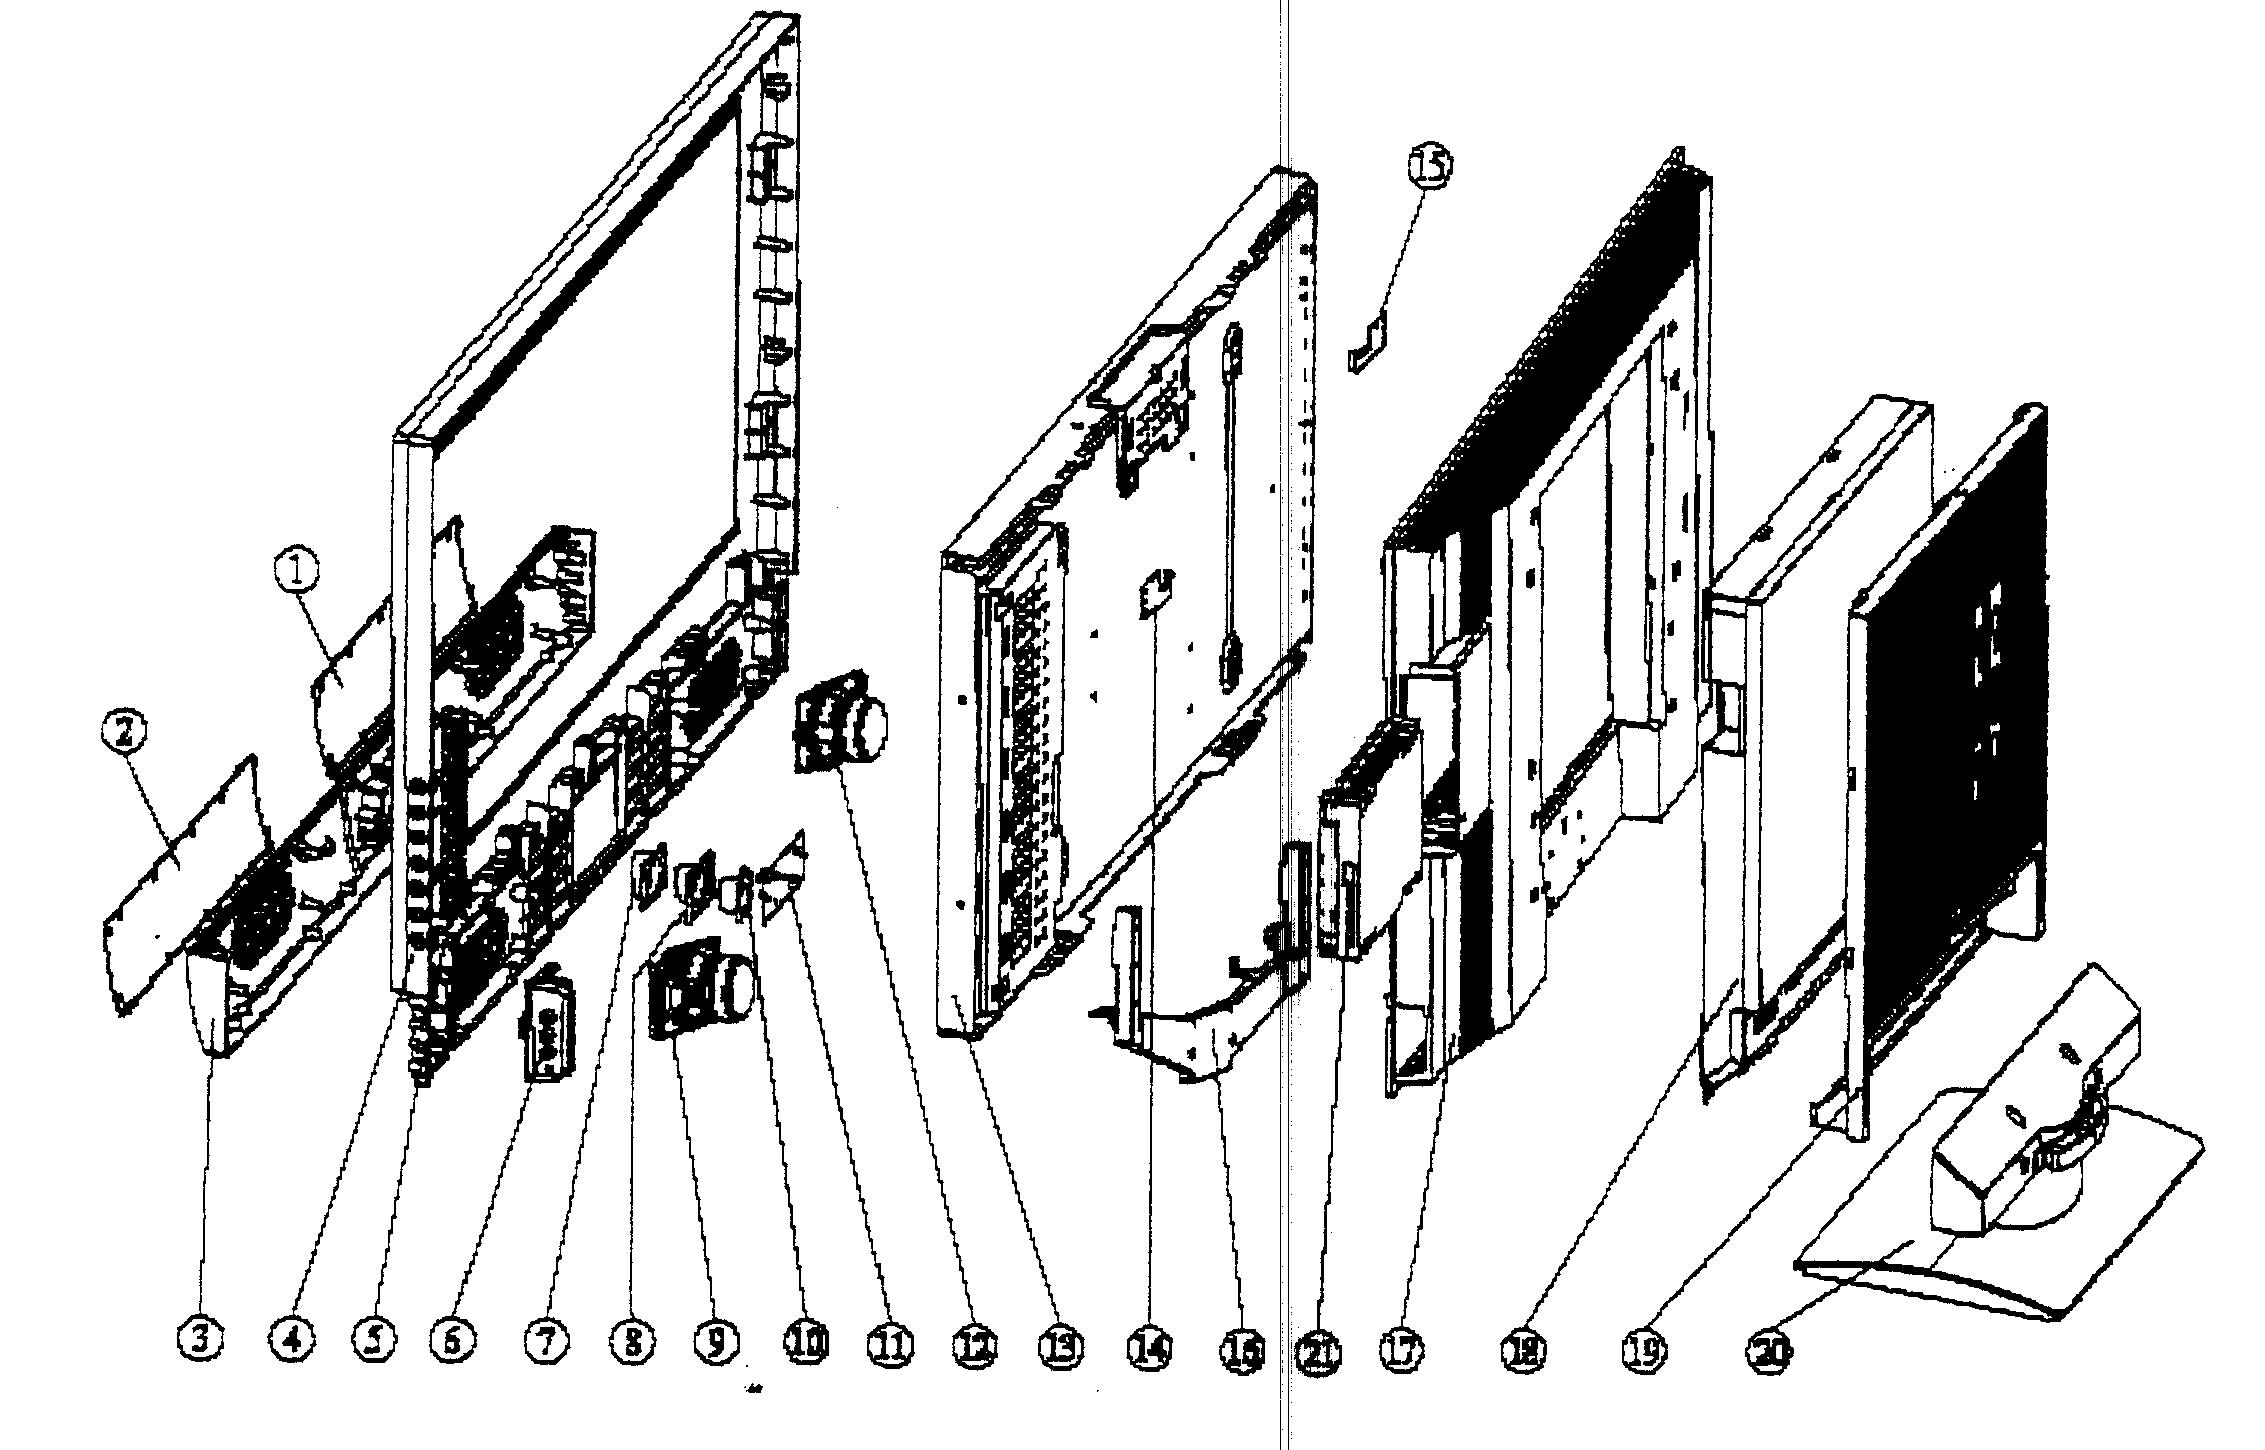 Memorex model MLTD3222 tv/vcr or dvd combo genuine parts